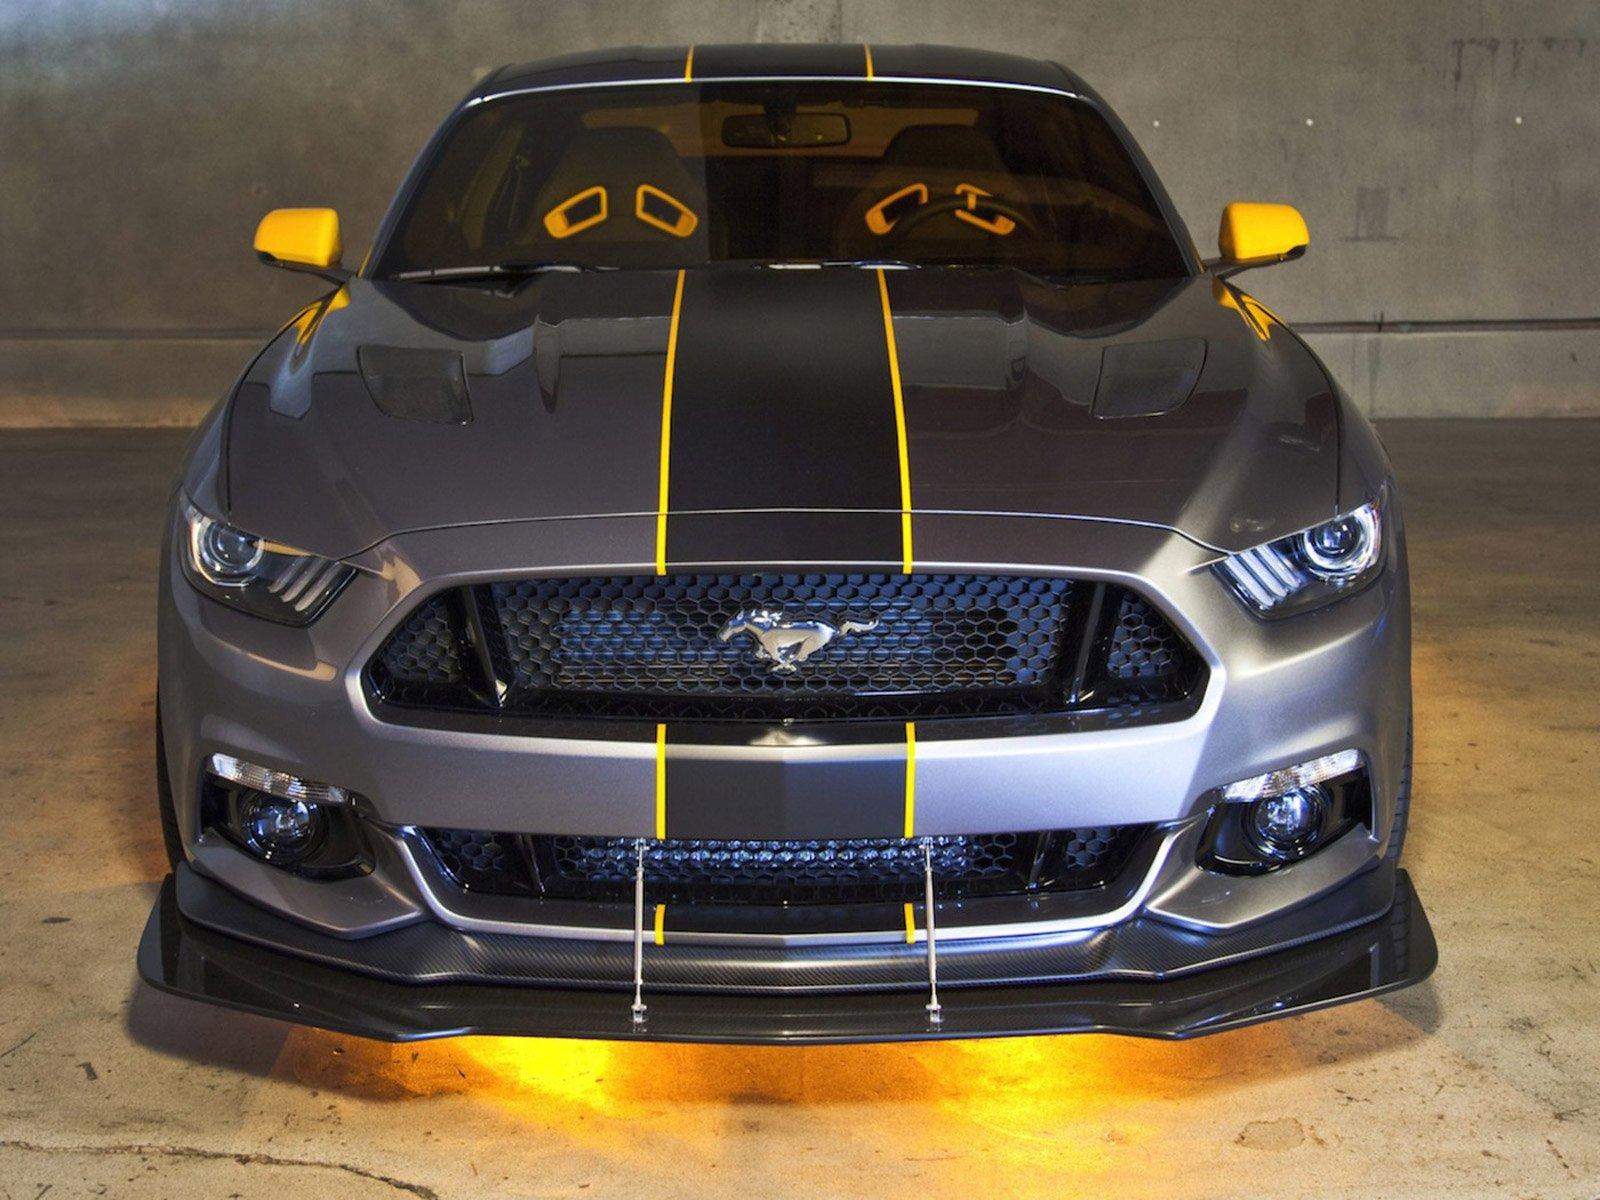 Ford Mustang 2015 Wallpaper